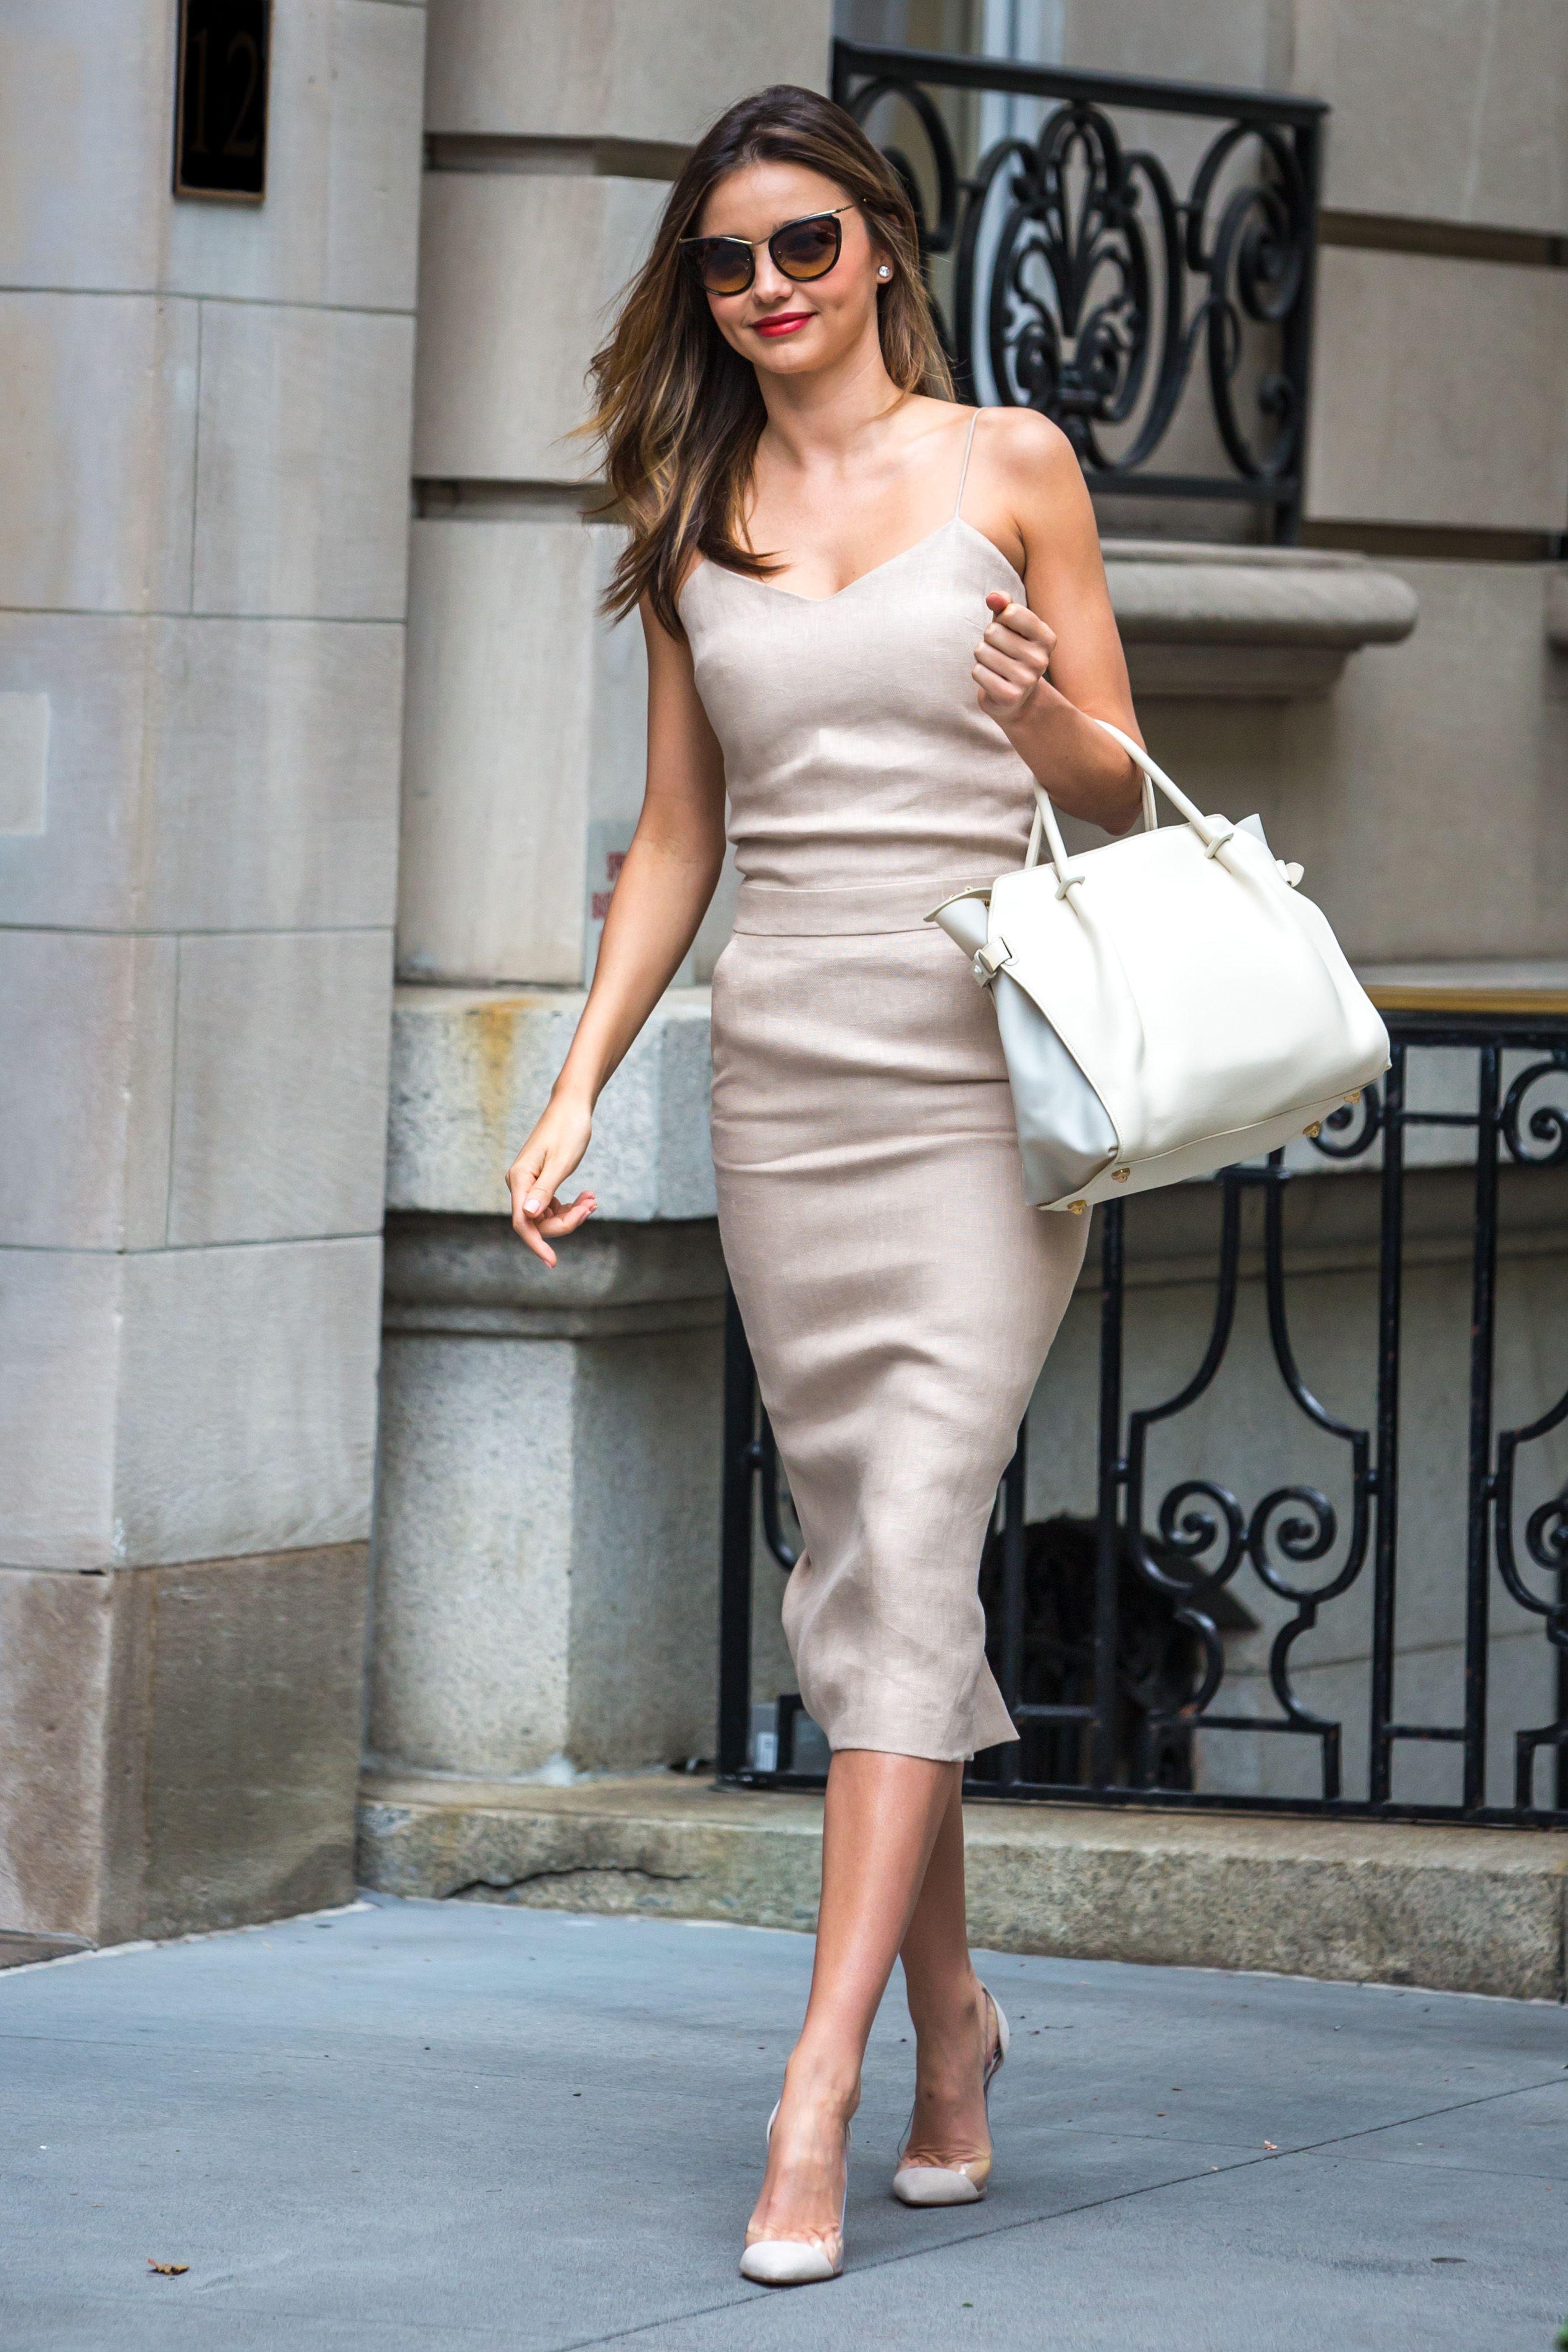 64f15acc40 Miranda Kerr carrying the Nina Ricci iconic bag